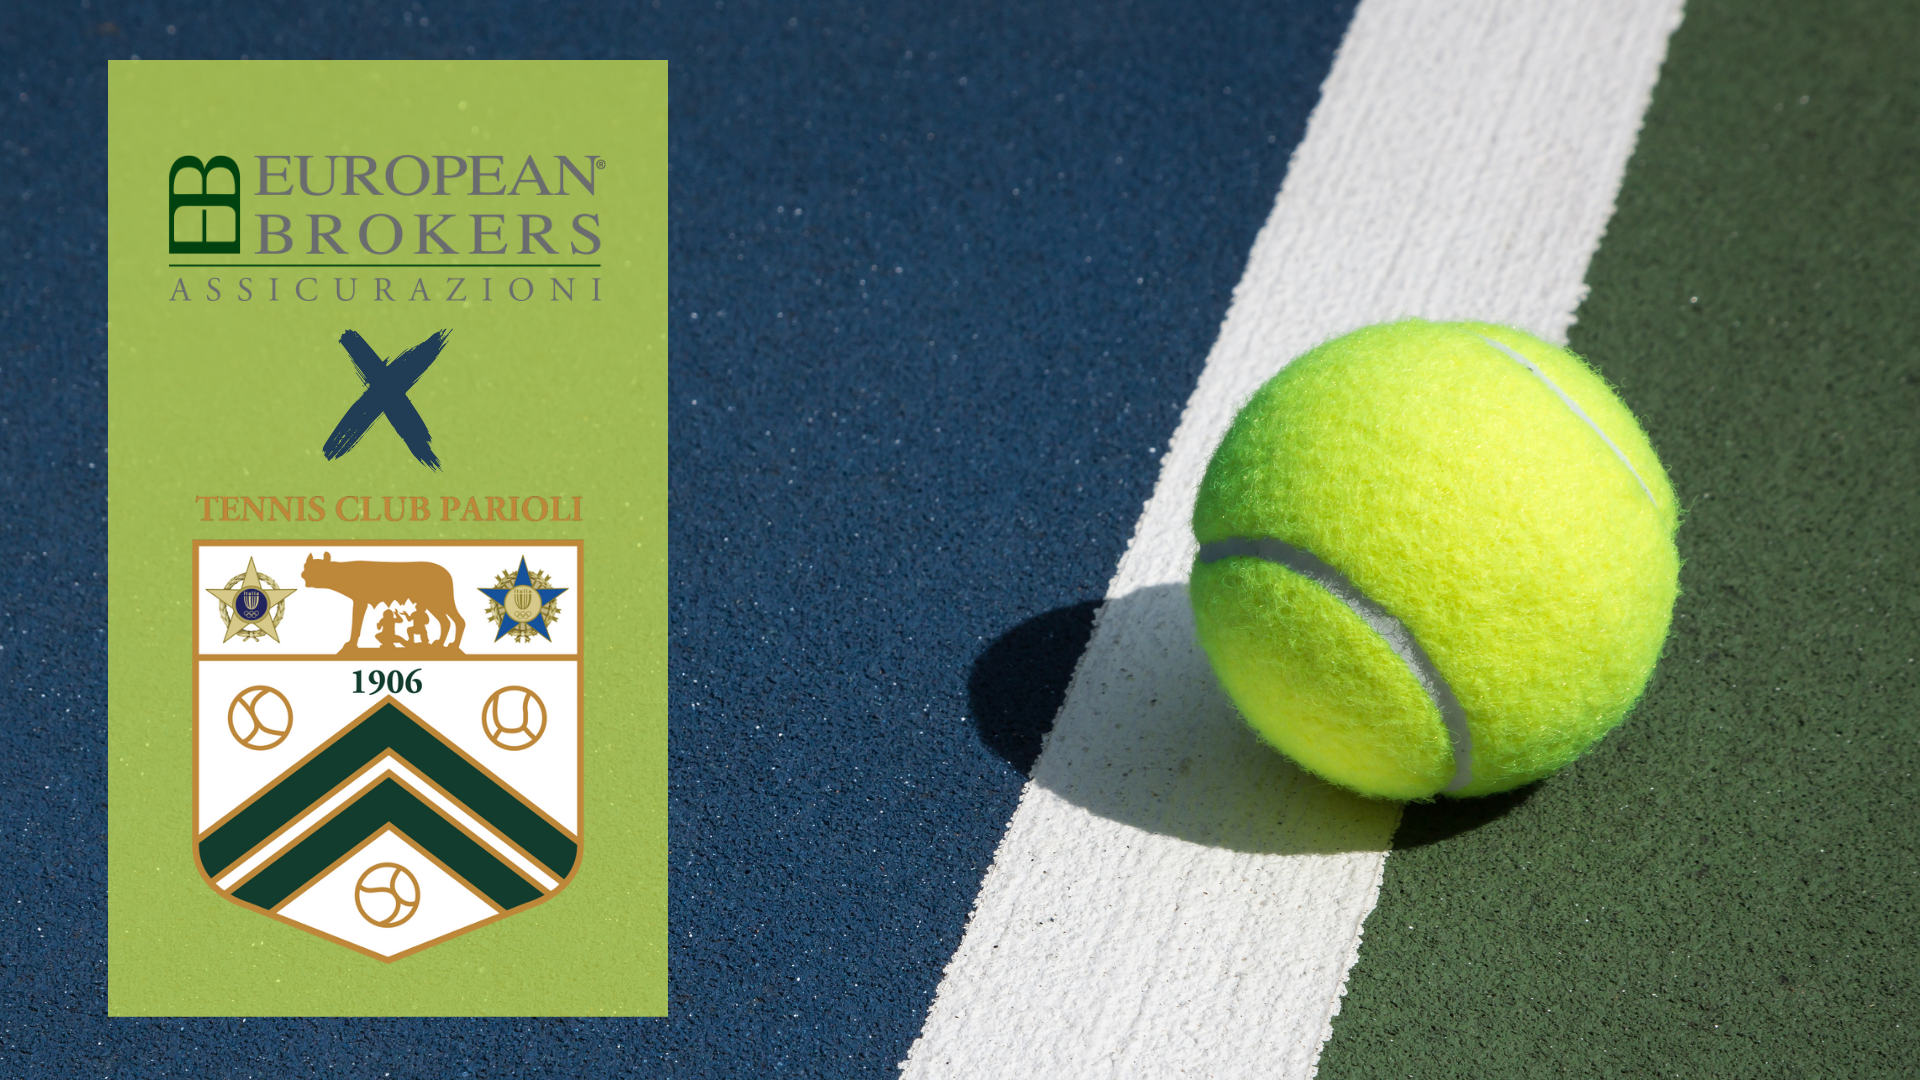 european brokers per tennis club parioli